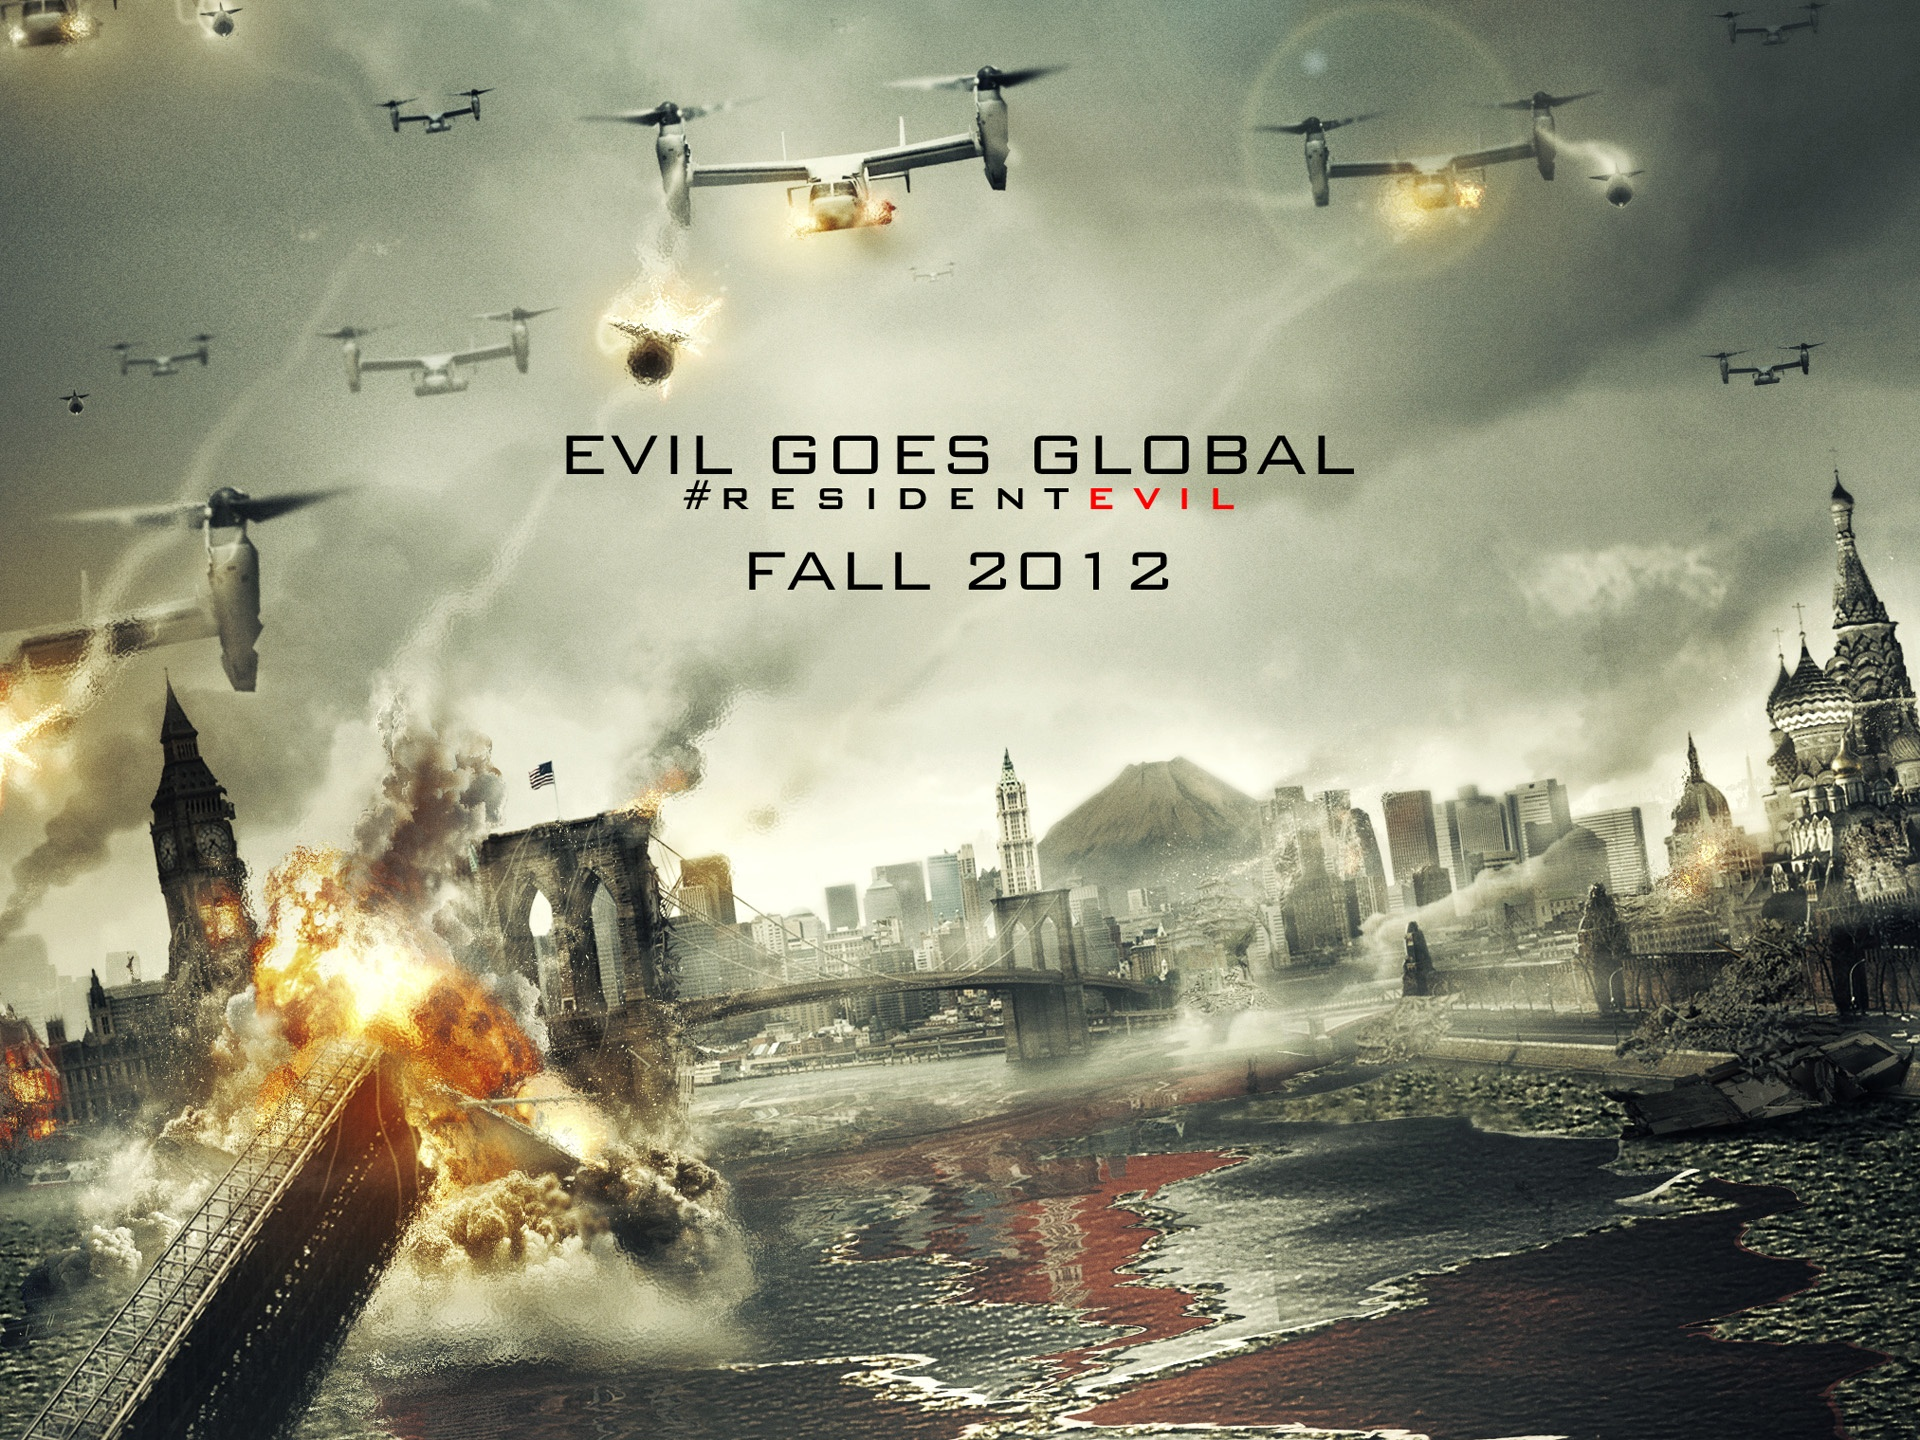 Wallpaper Resident Evil Retribution 2012 1920x1440 Hd Picture Image